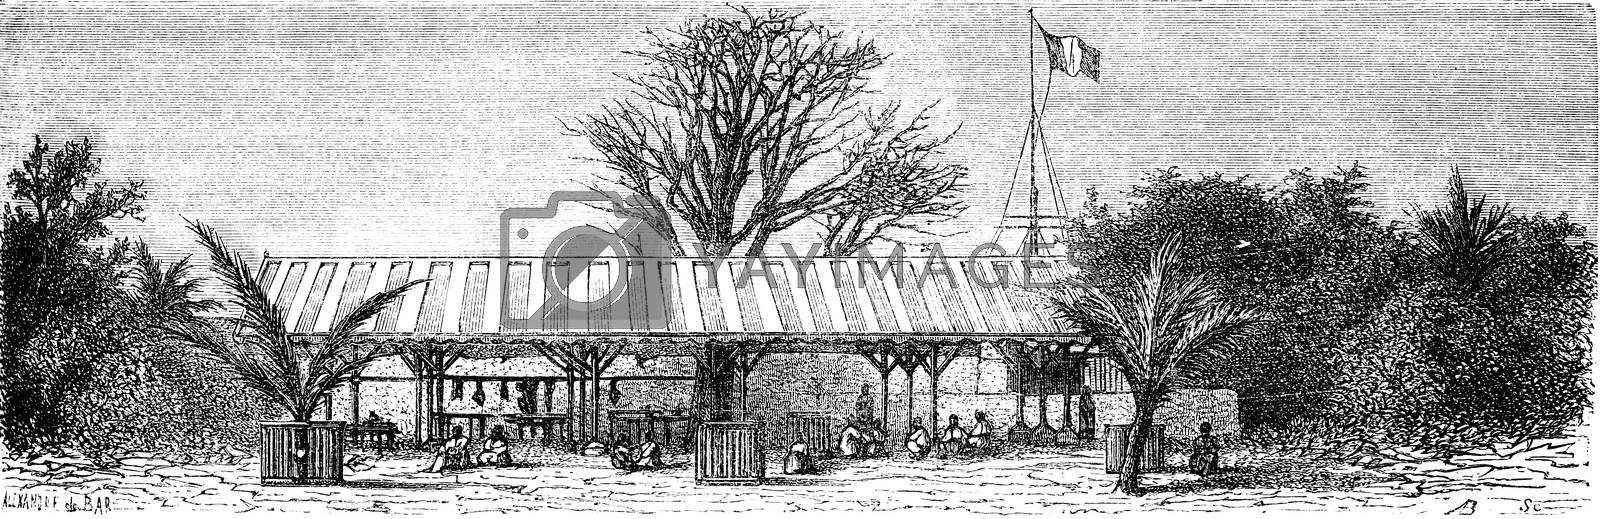 March Goree, vintage engraved illustration. Le Tour du Monde, Travel Journal, (1872).